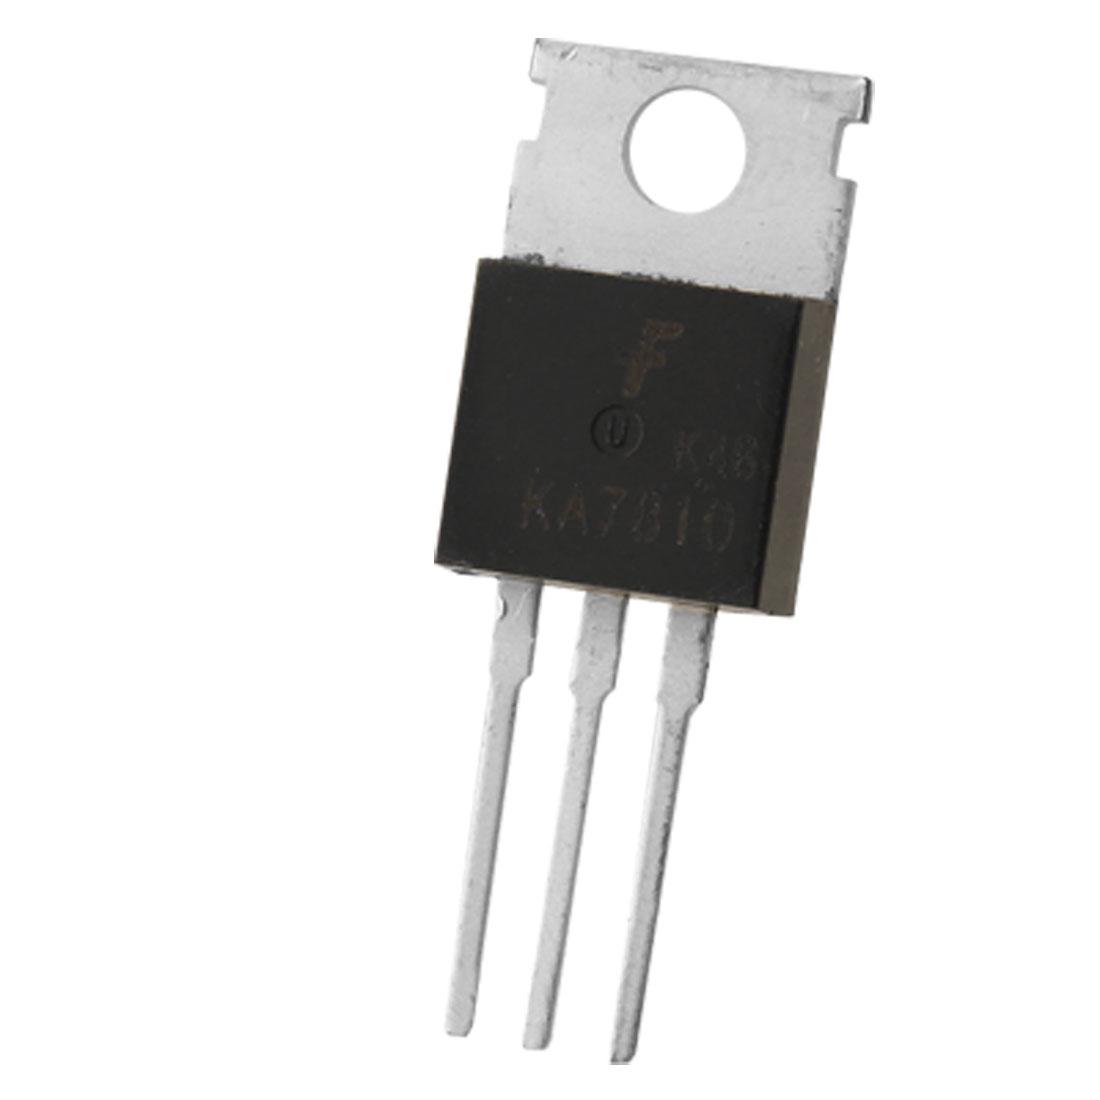 KA7810 3-Terminal 1A 10V Positive Voltage Regulator 2 Pcs